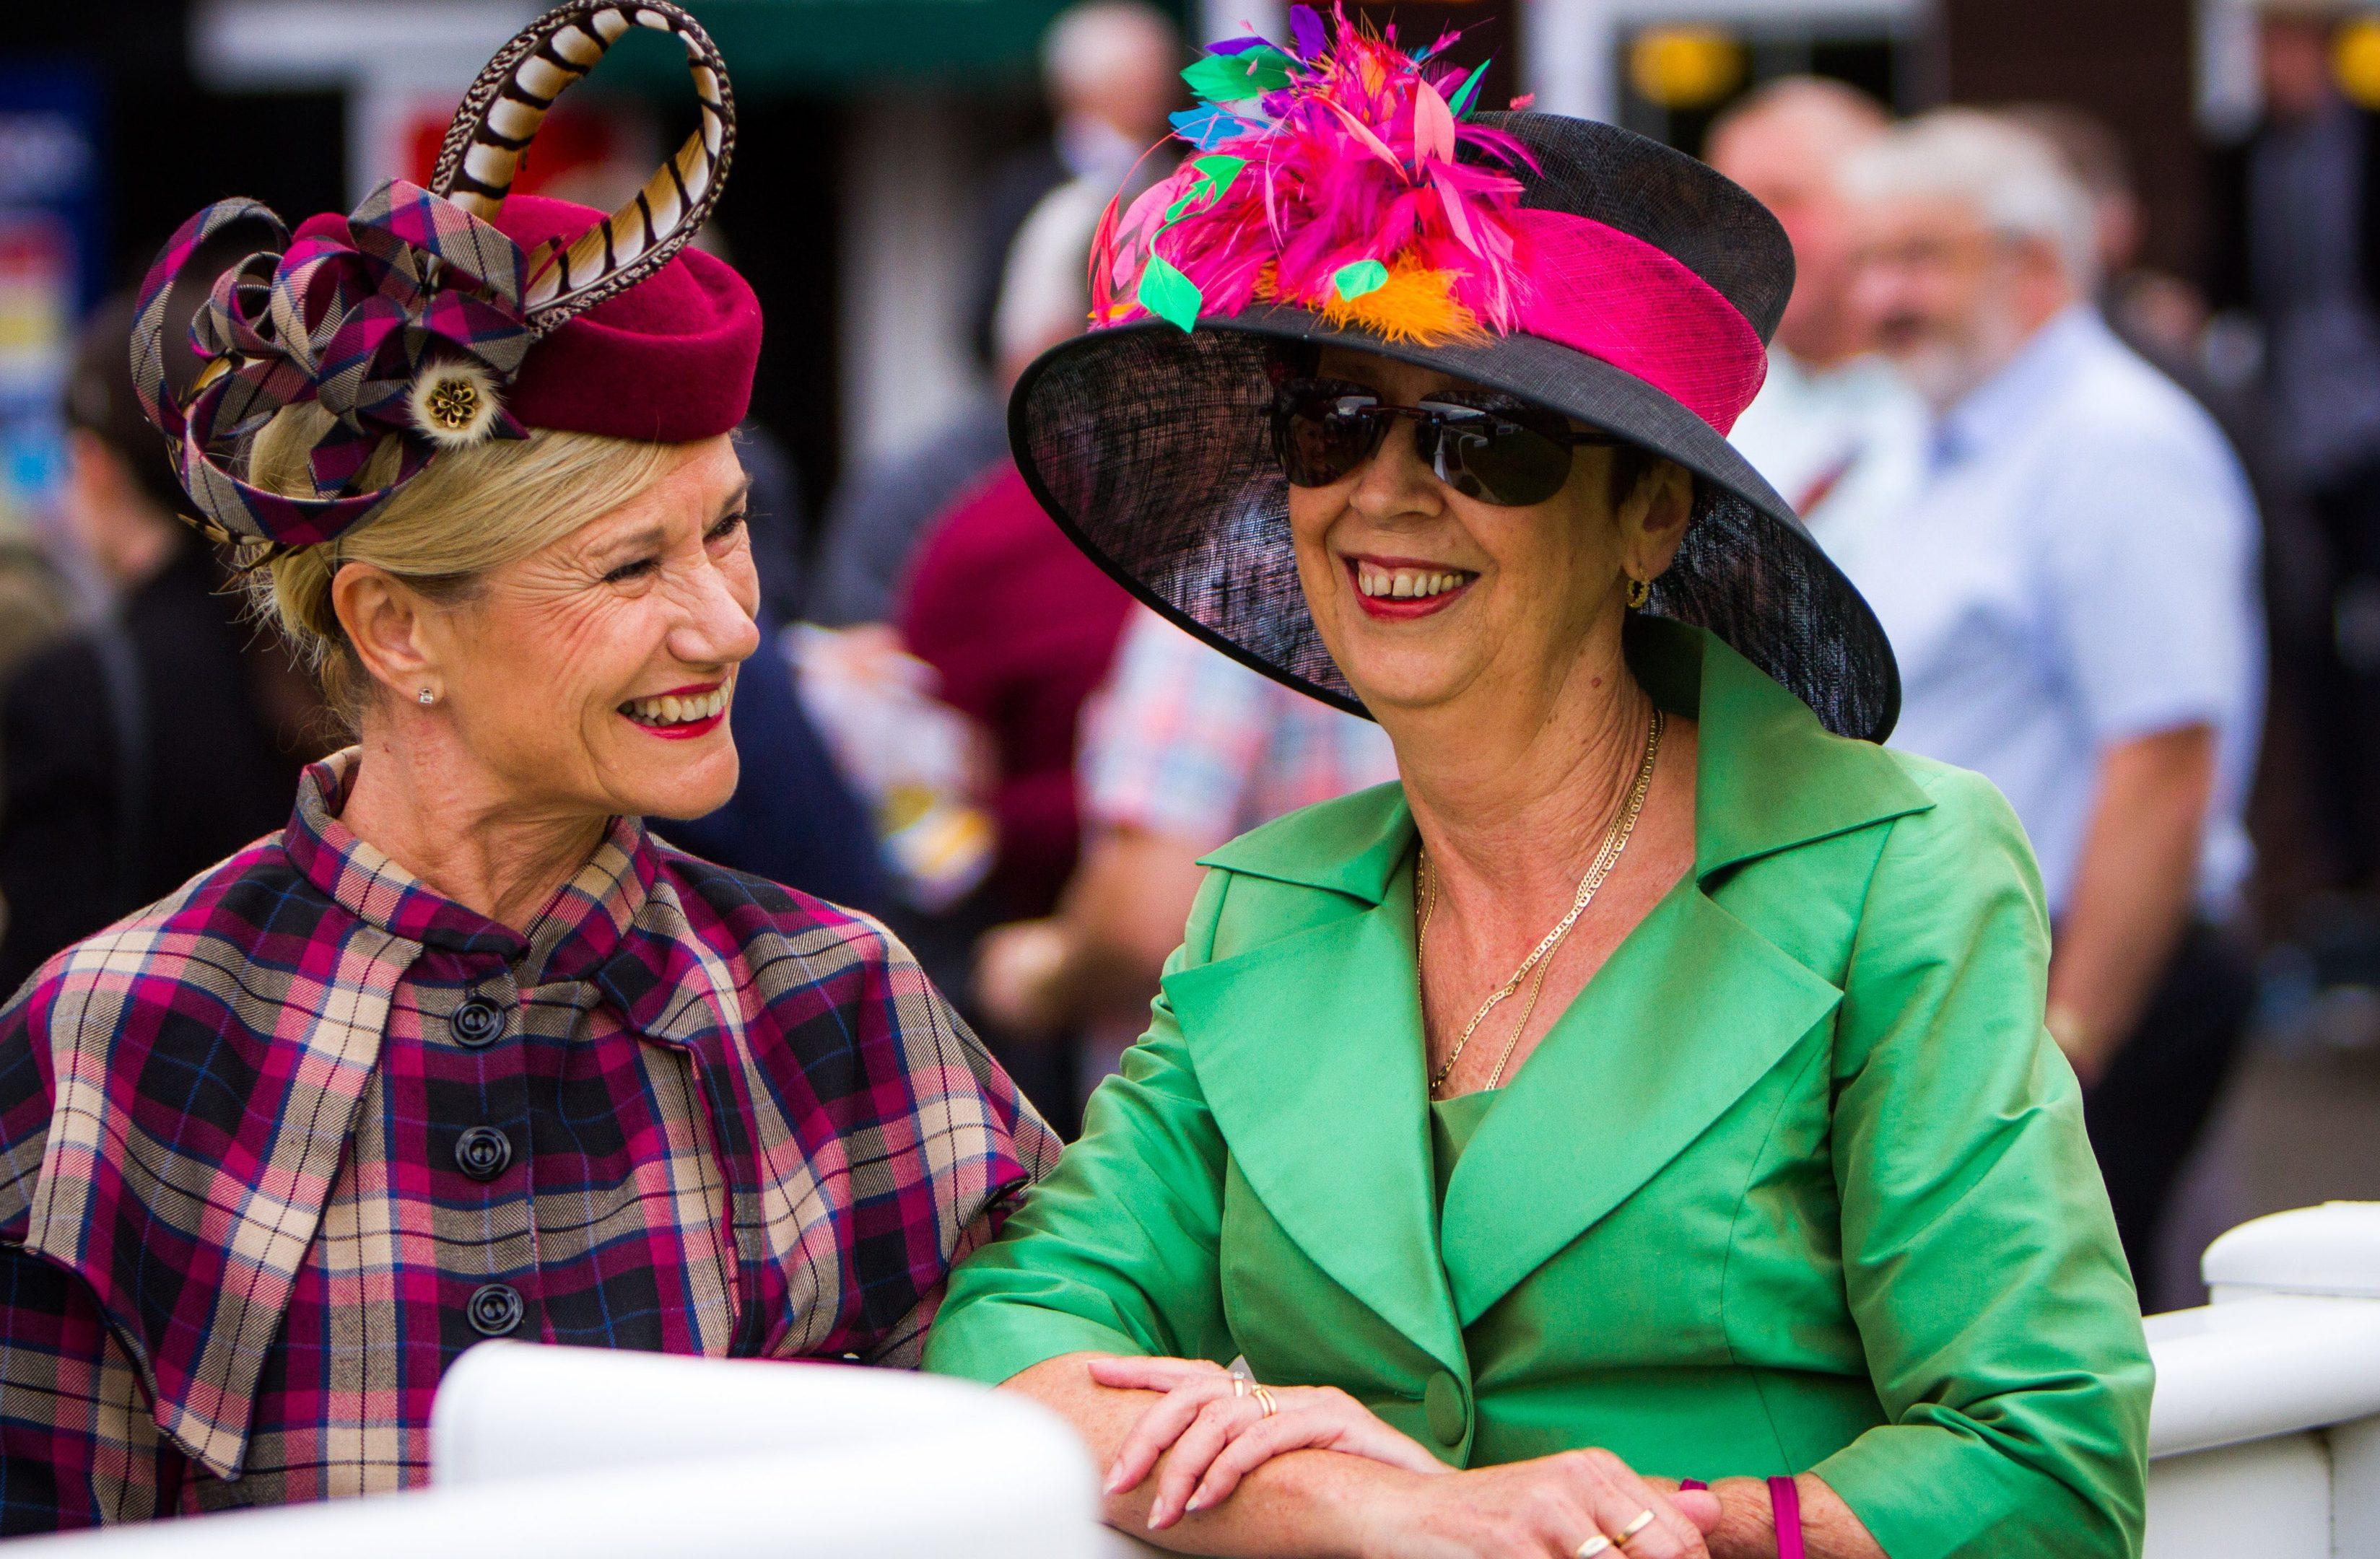 Judith Beckett (left) and Karen Carlisle, both from Derbyshire; Karen won 'Most Colourful'.